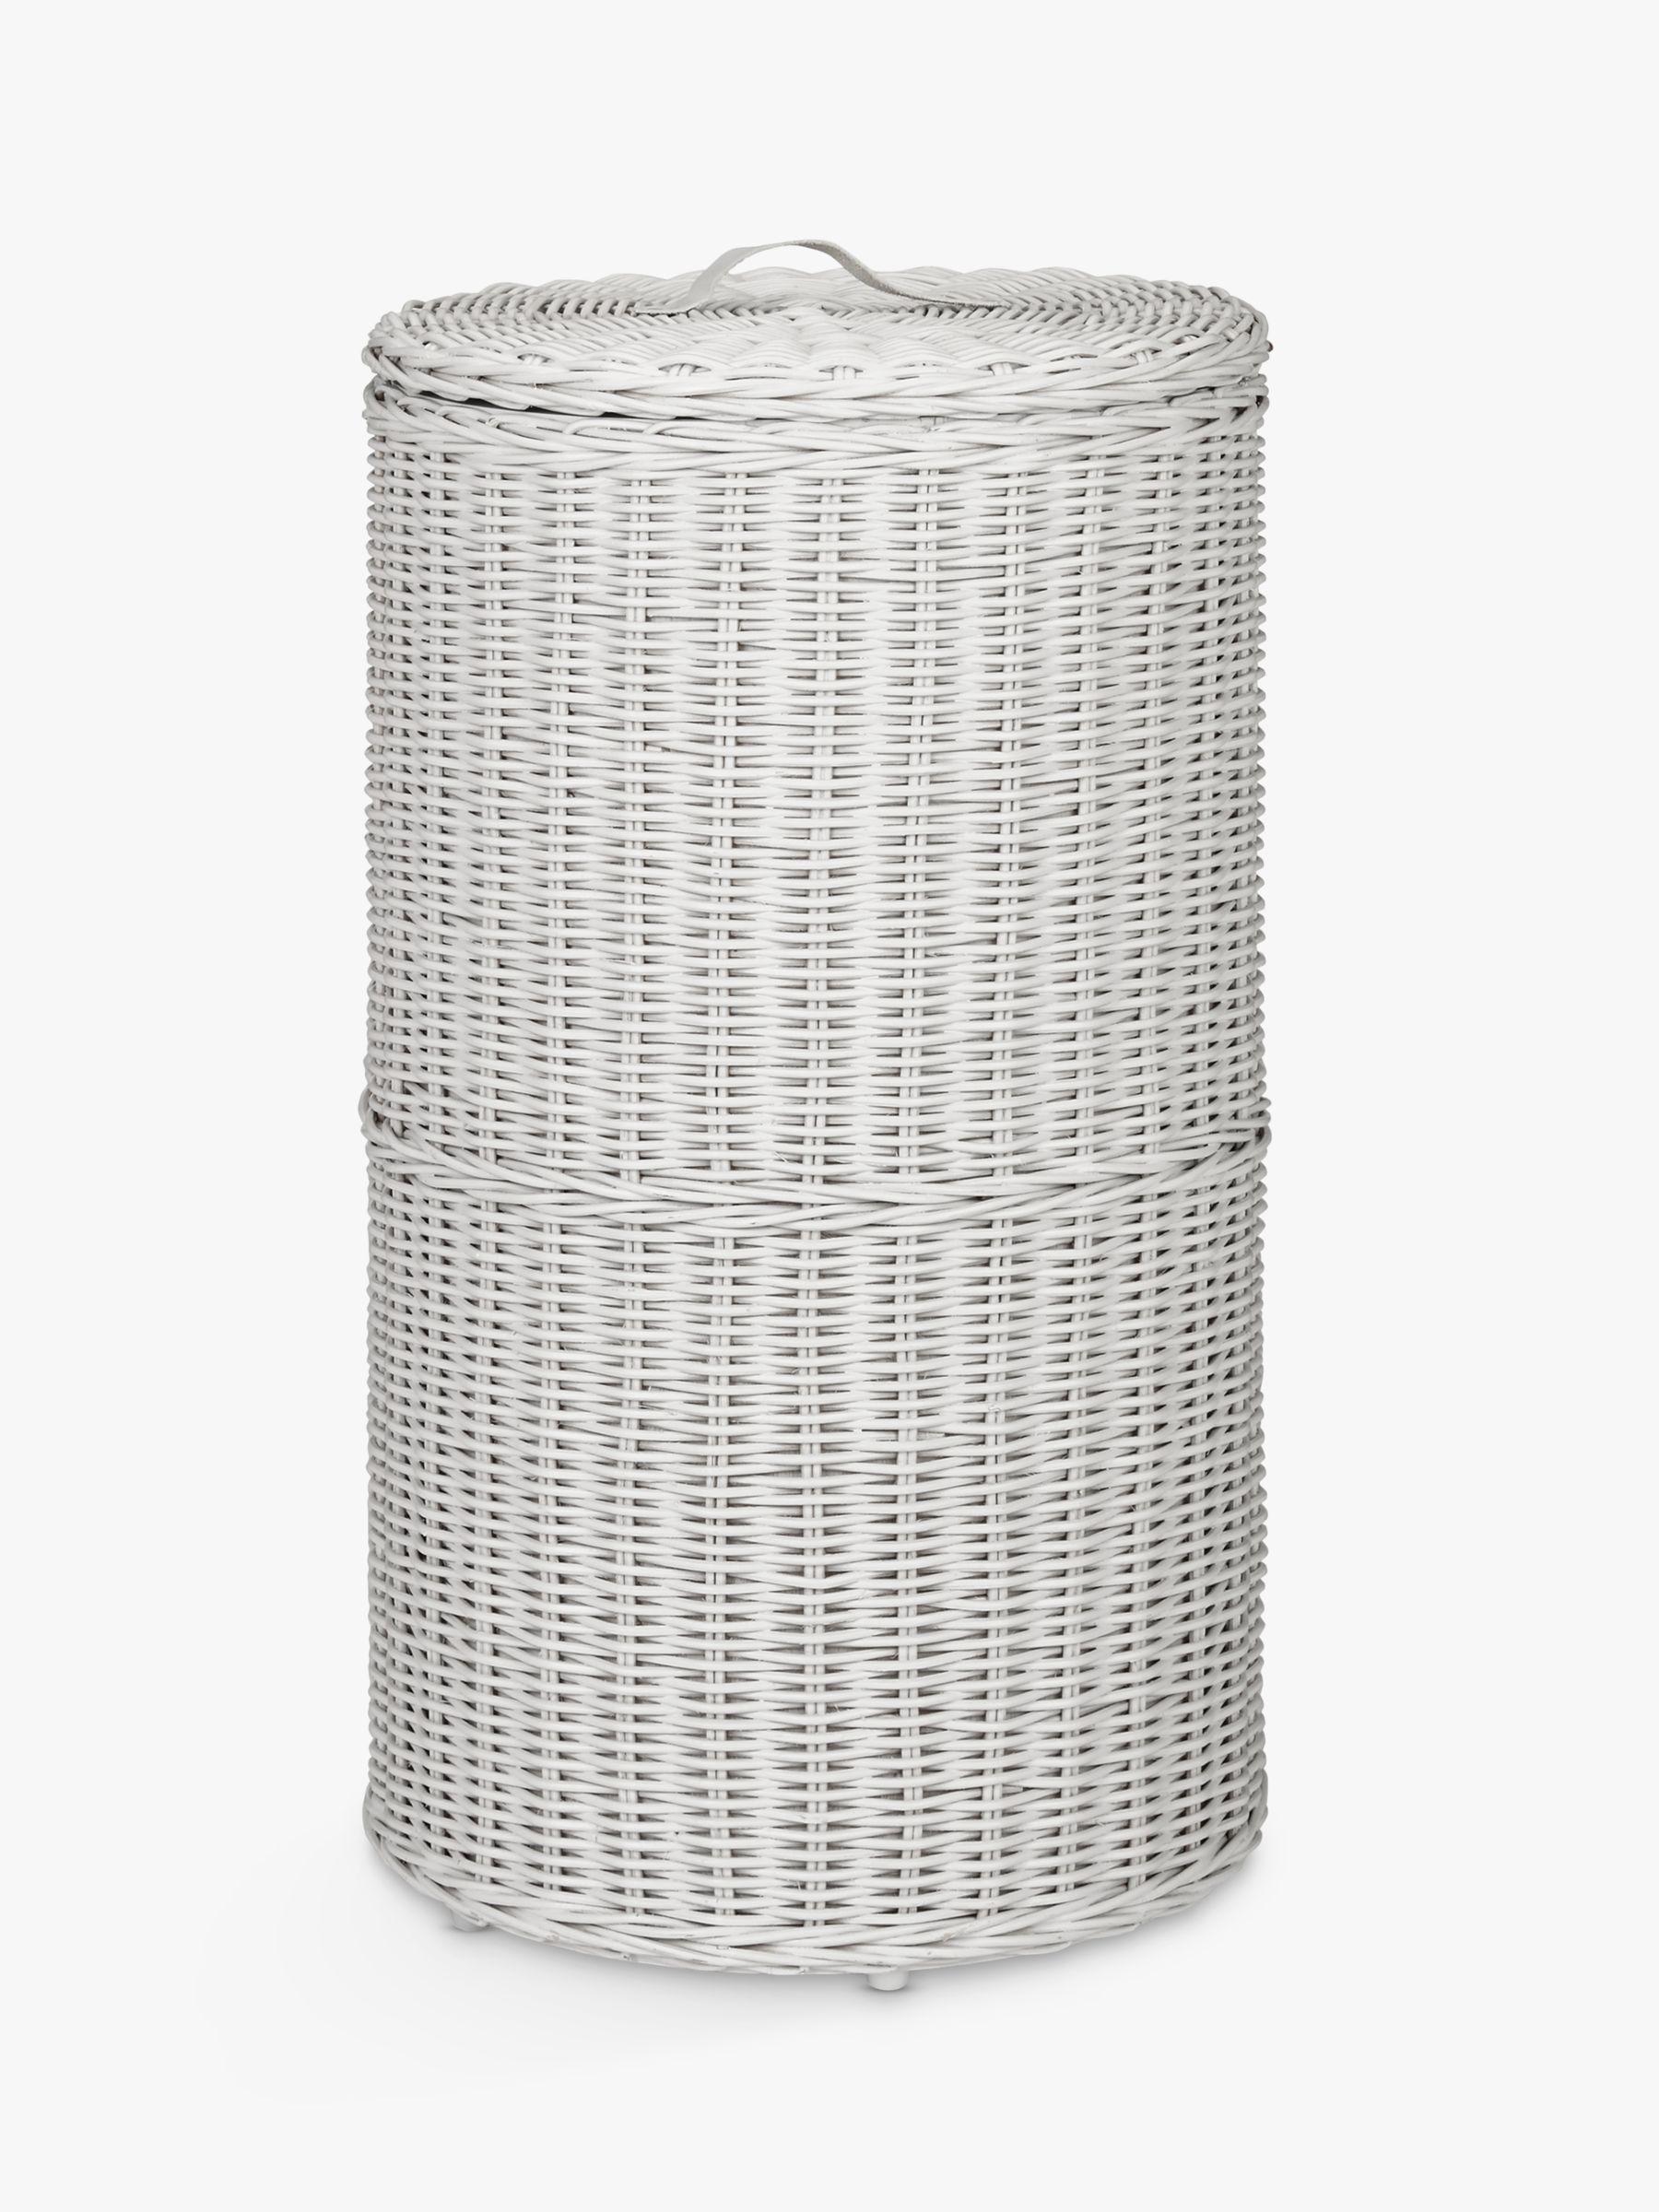 John Lewis Partners Rattan Round Laundry Basket Grey At John Lewis Partners